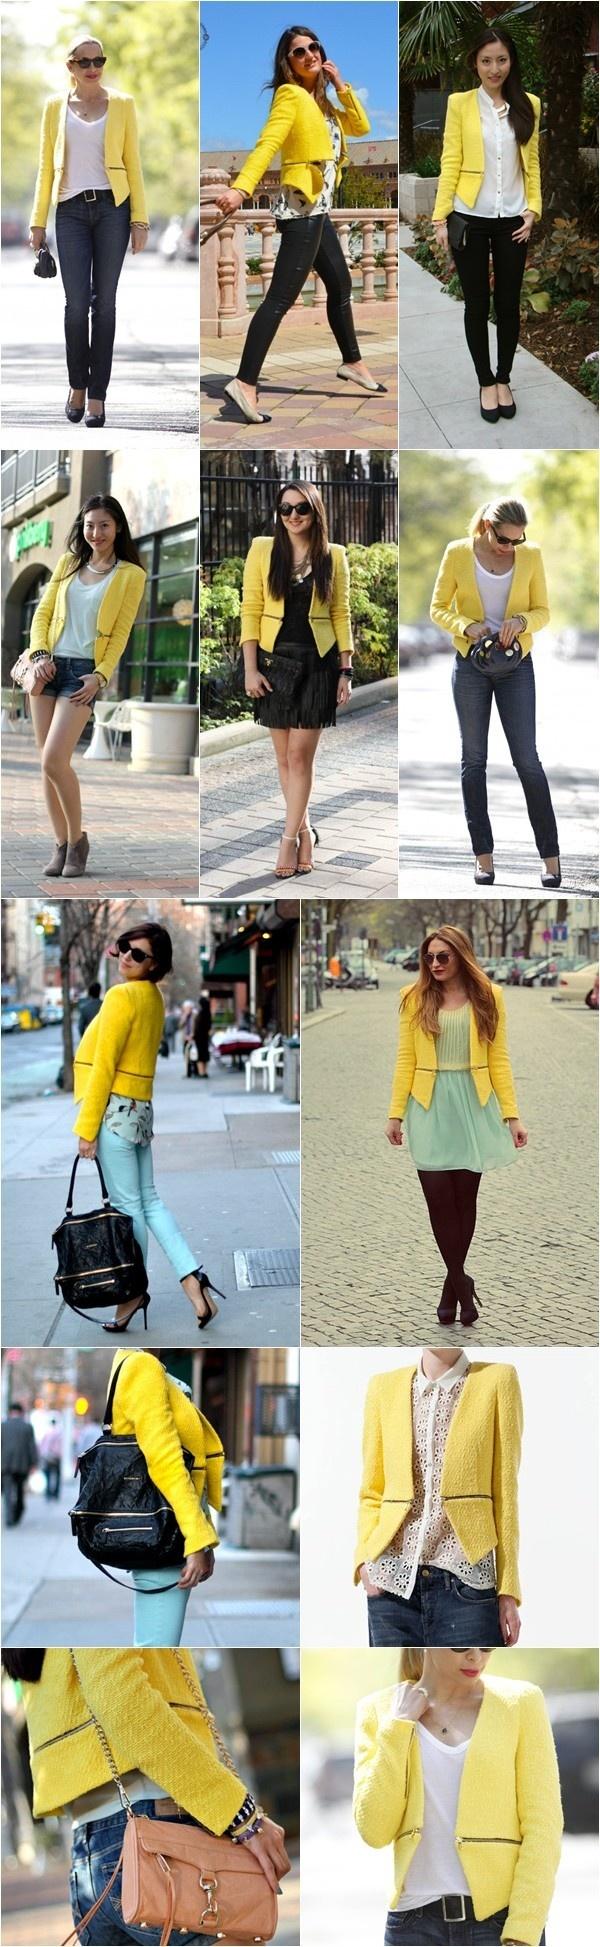 zara-blazer-amarelo #EasyPin